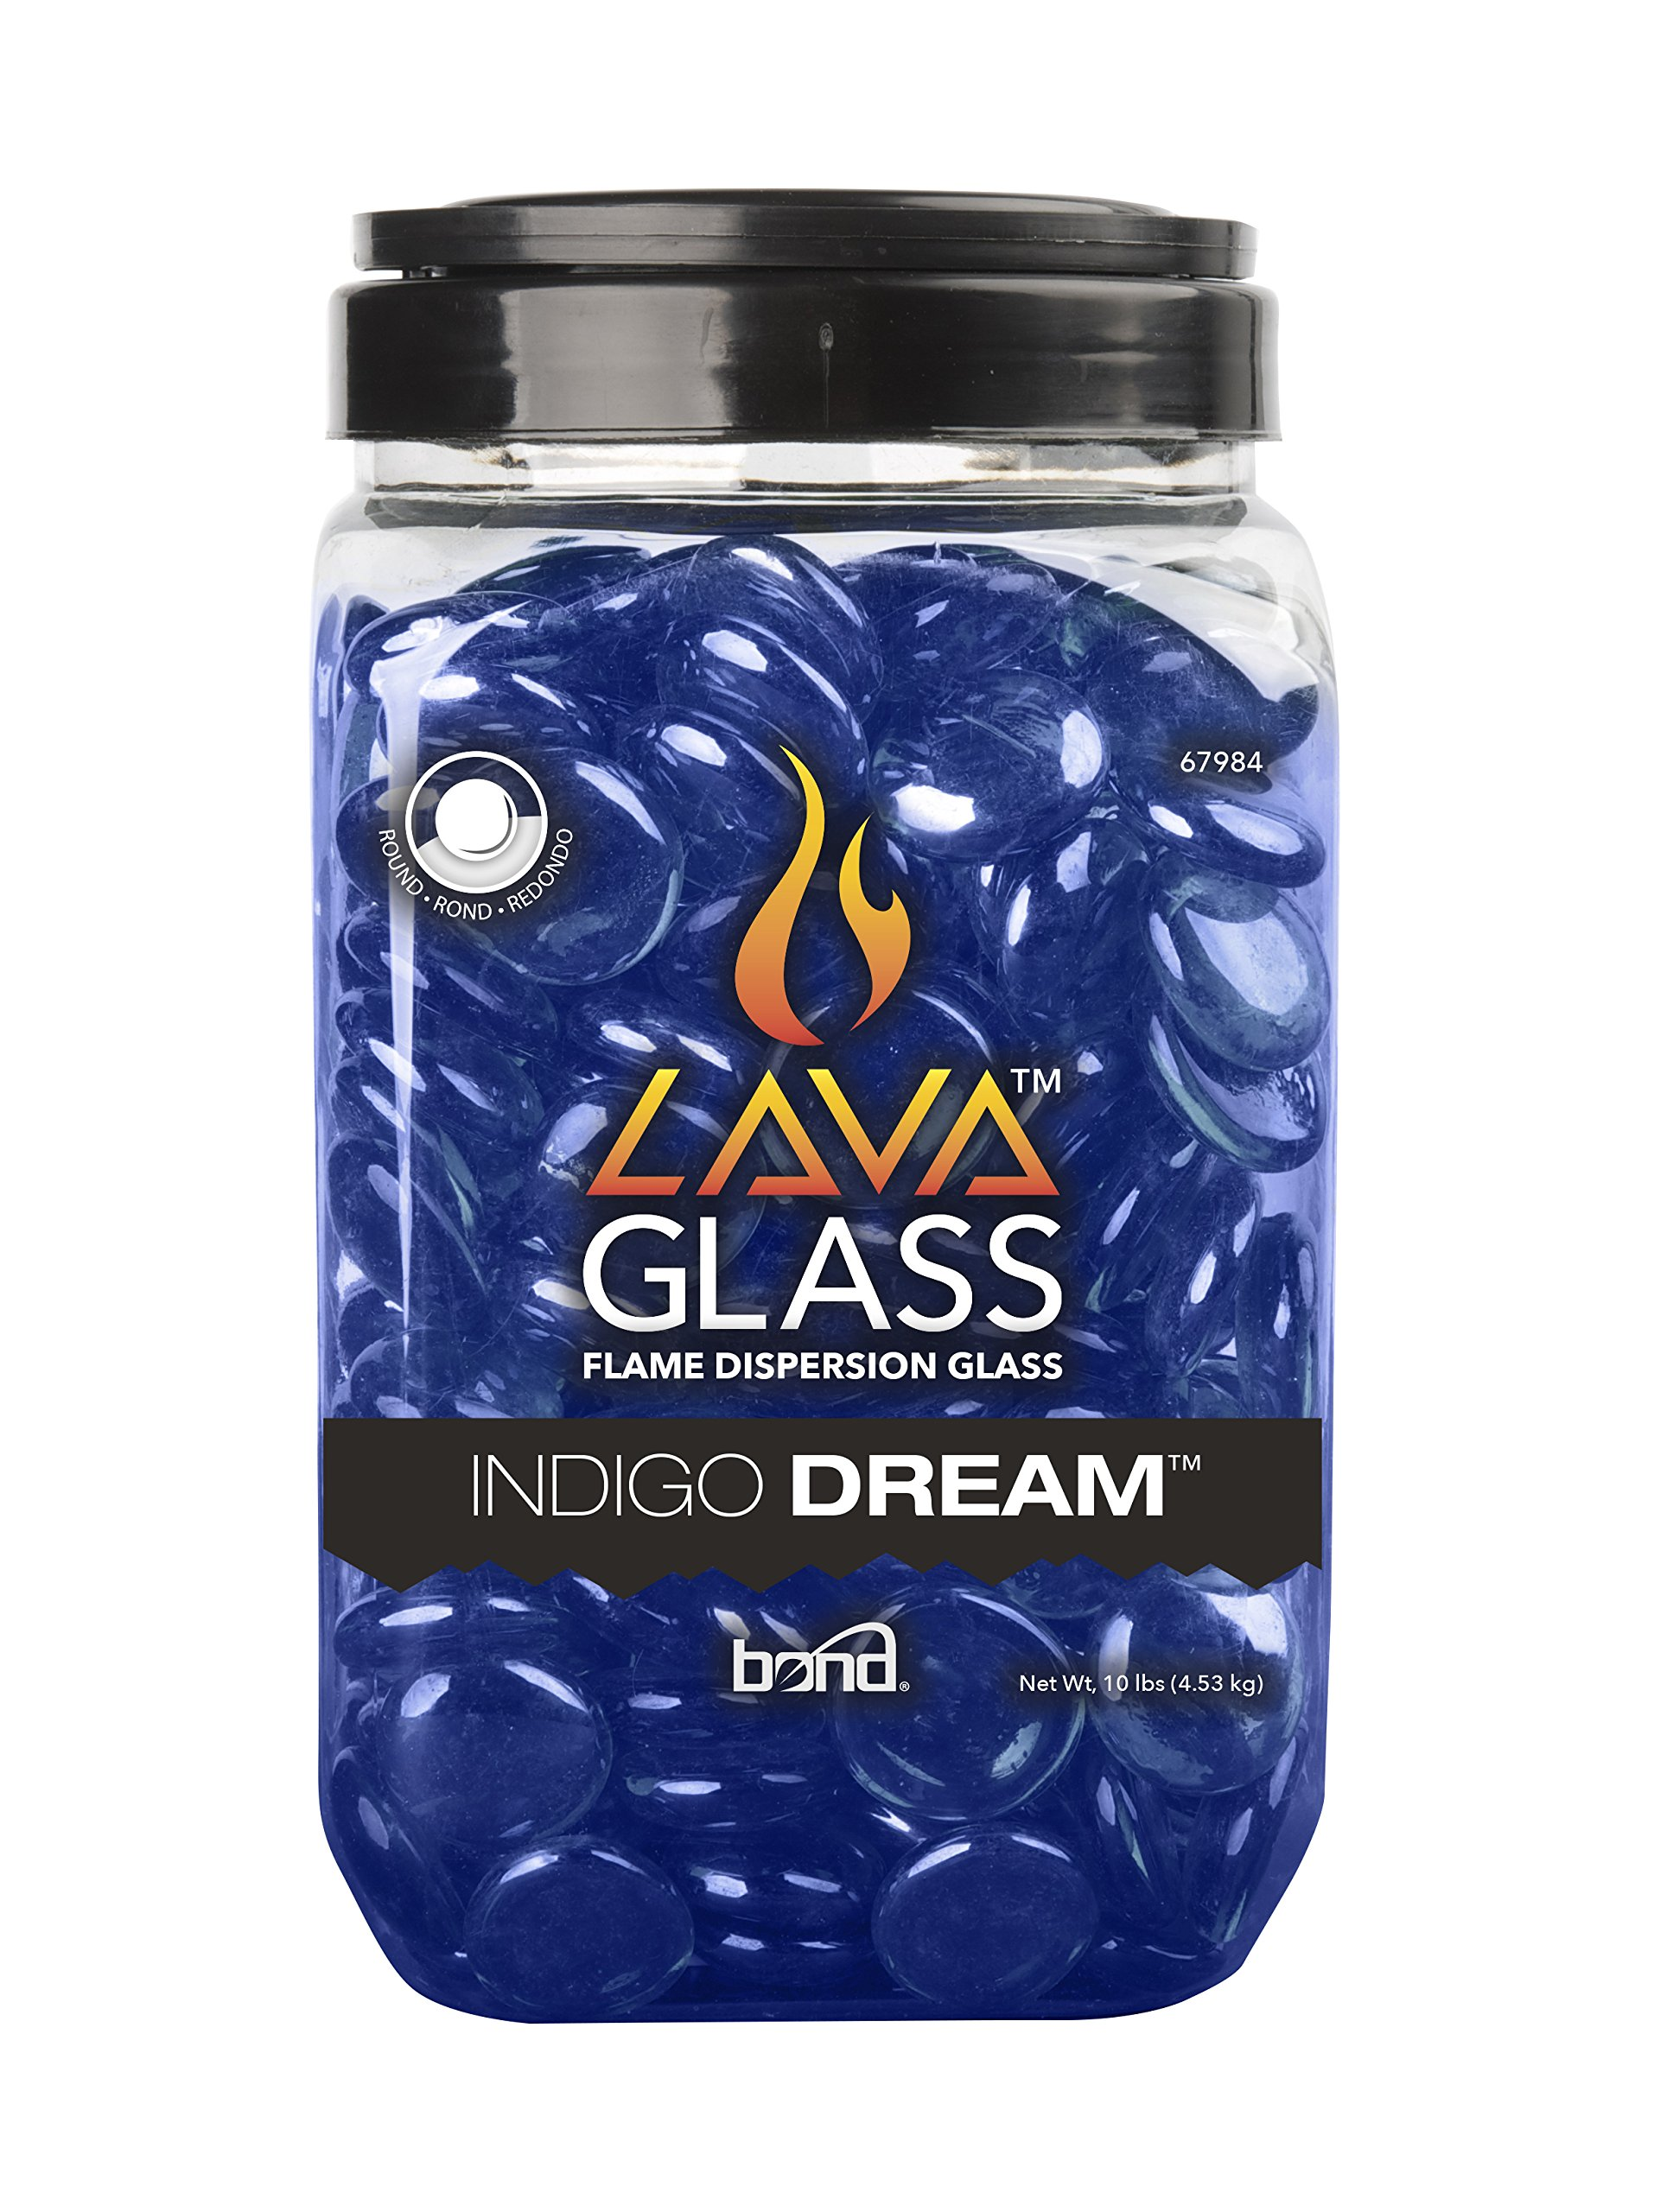 Bond Manufacturing Round Lavaglass for Gas Fire Pits, Indigo Dream